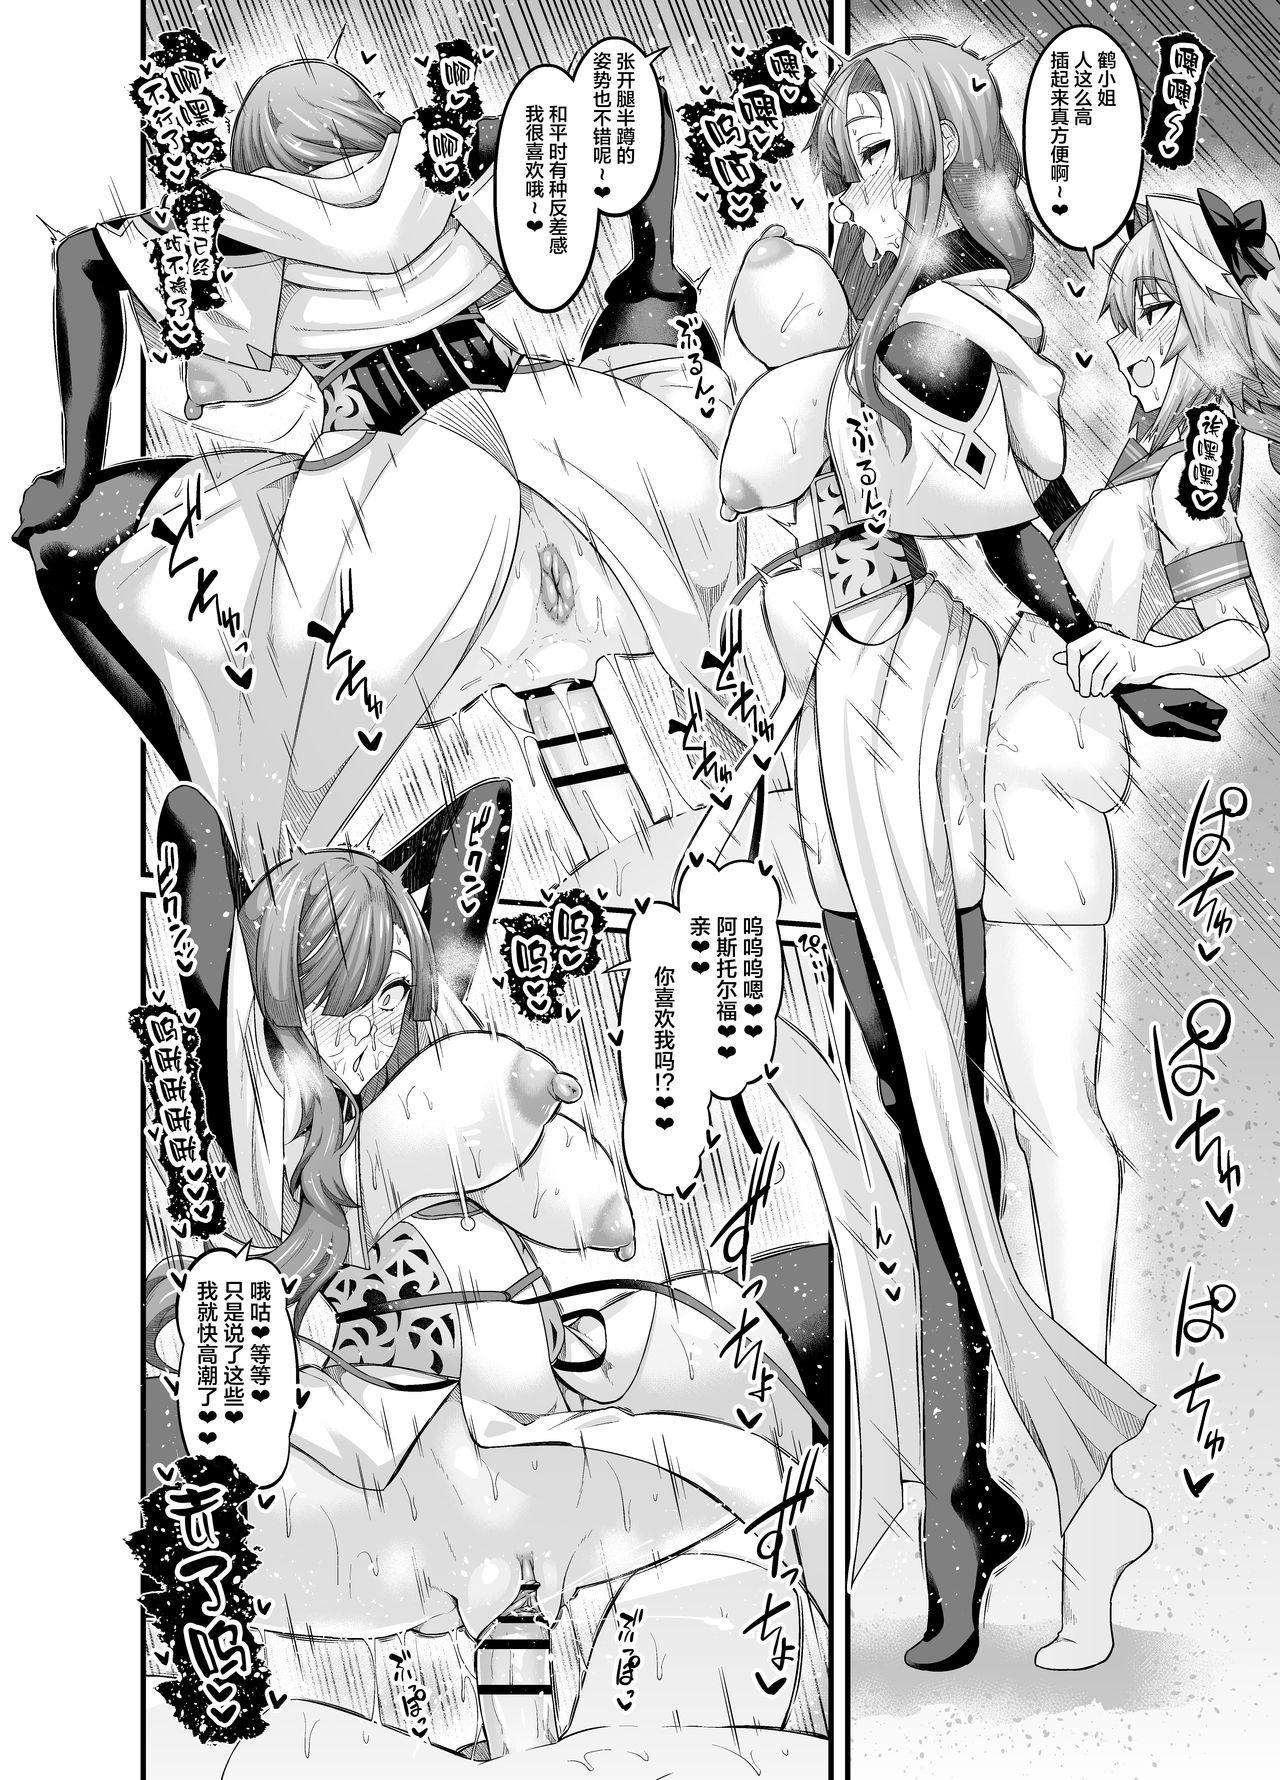 Miss Crane, Astolfo to Nakayoku Naru 3